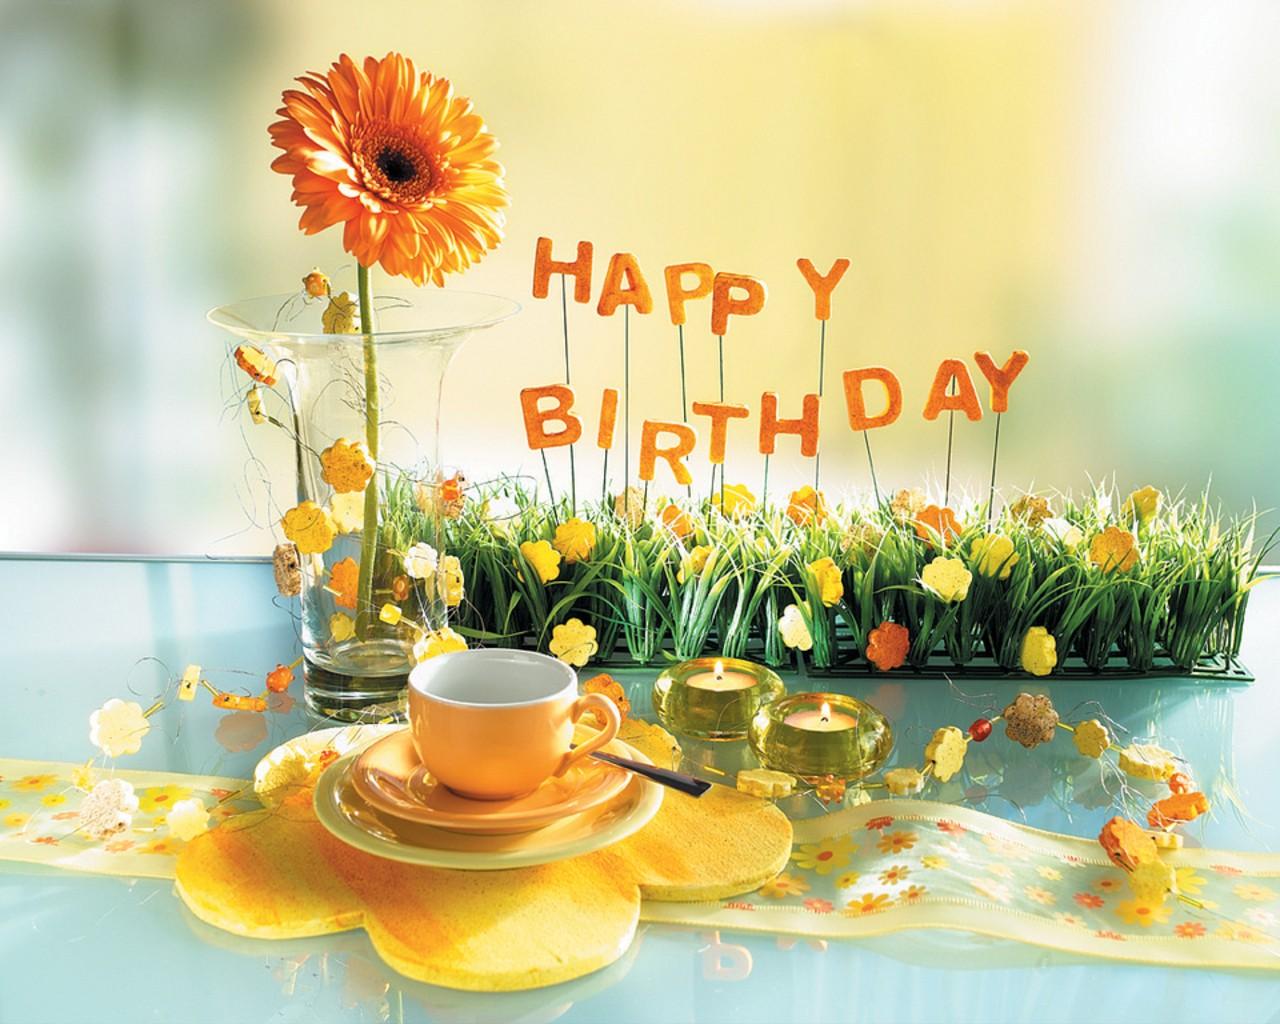 Happy Birthday Wallpapers Mastimasaalacom 1280x1024